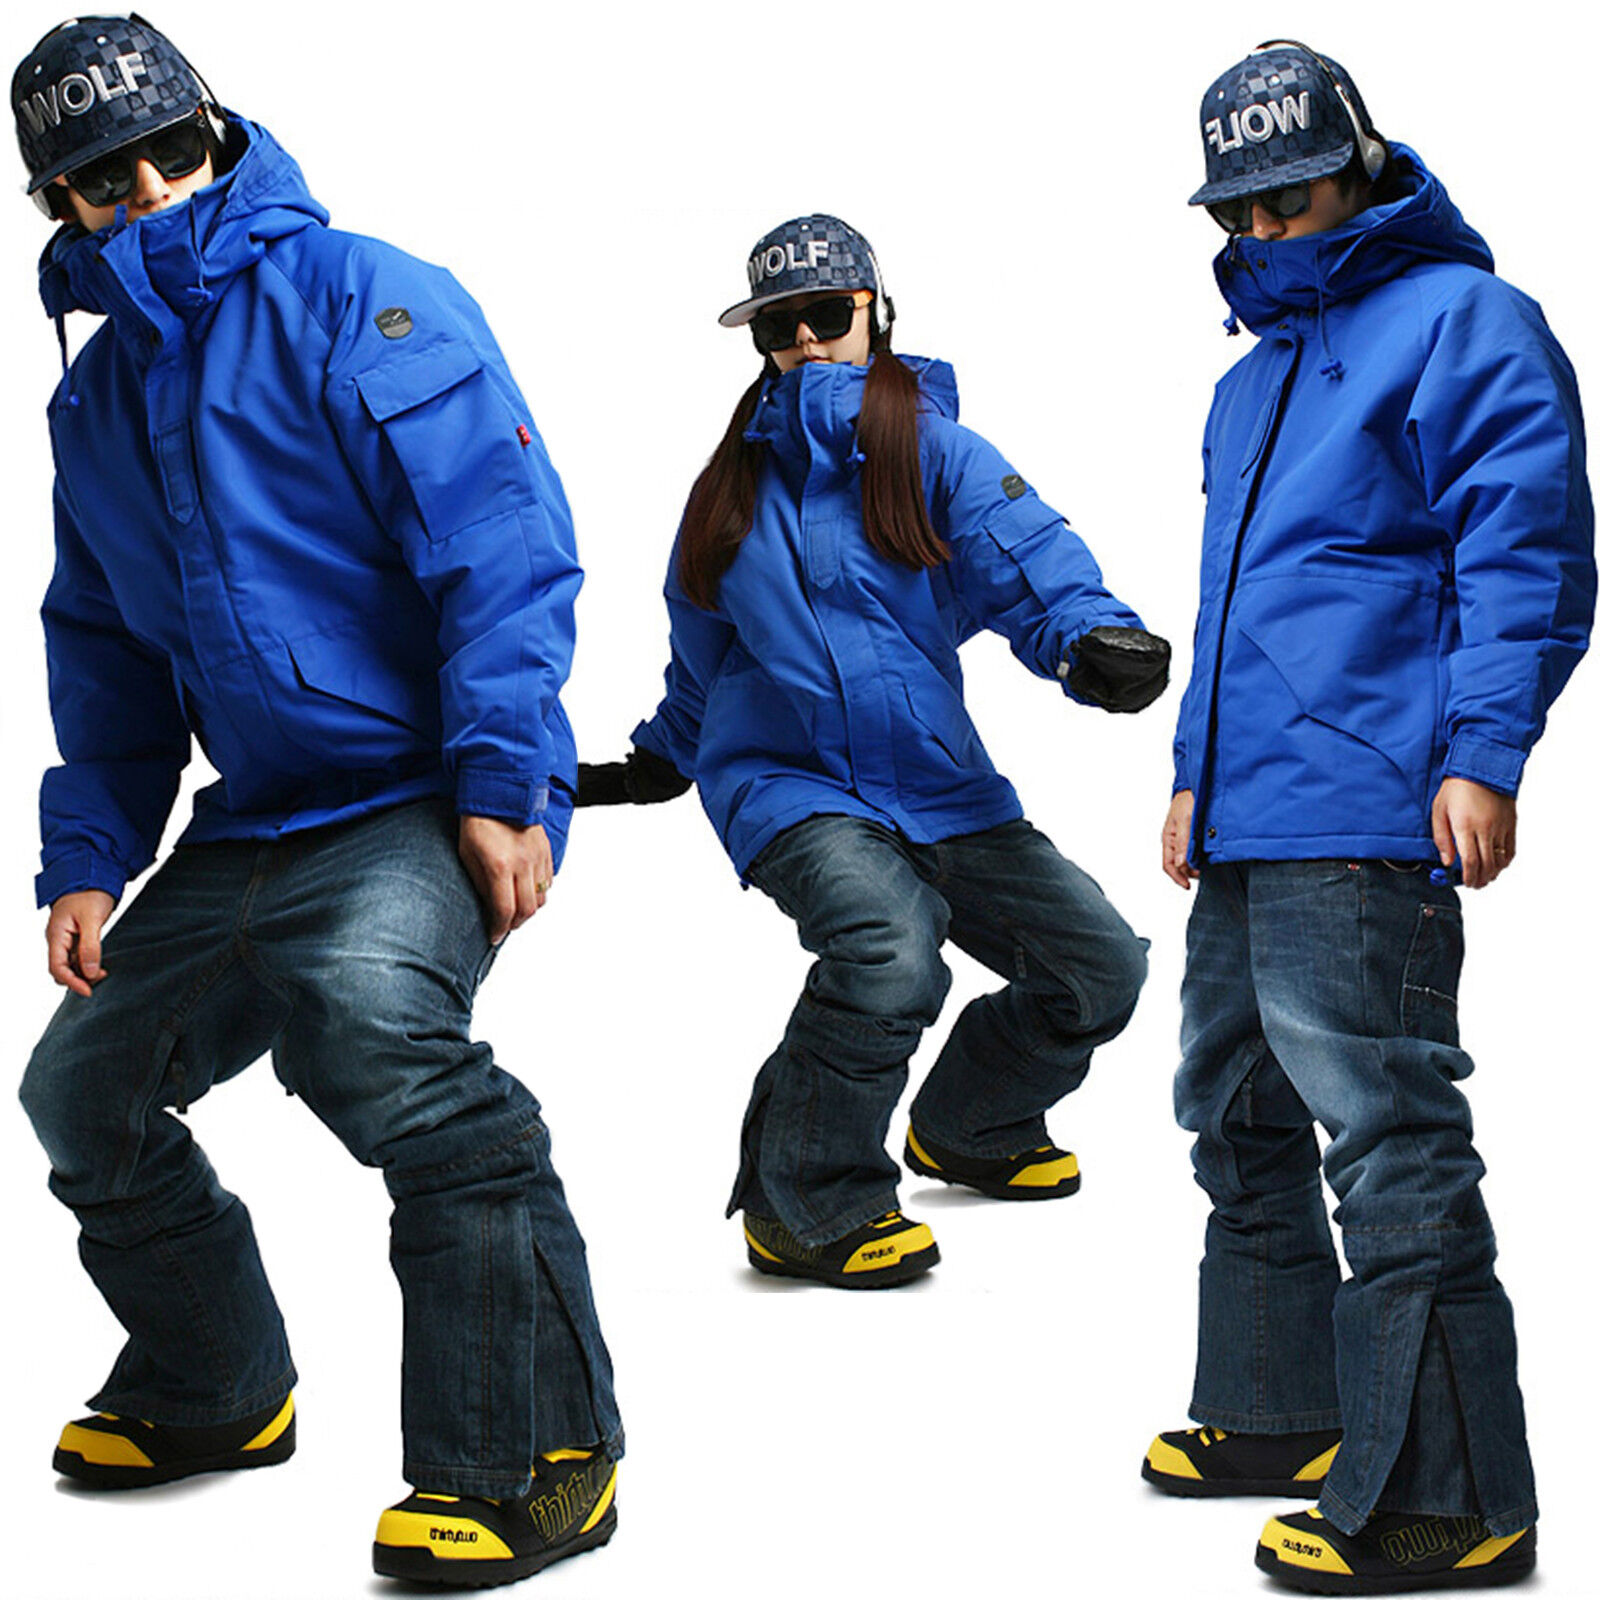 SOUTH PLAY Best Quality Ski Snowboard Jumper Blazer Jacket Pants Suits Blau SET